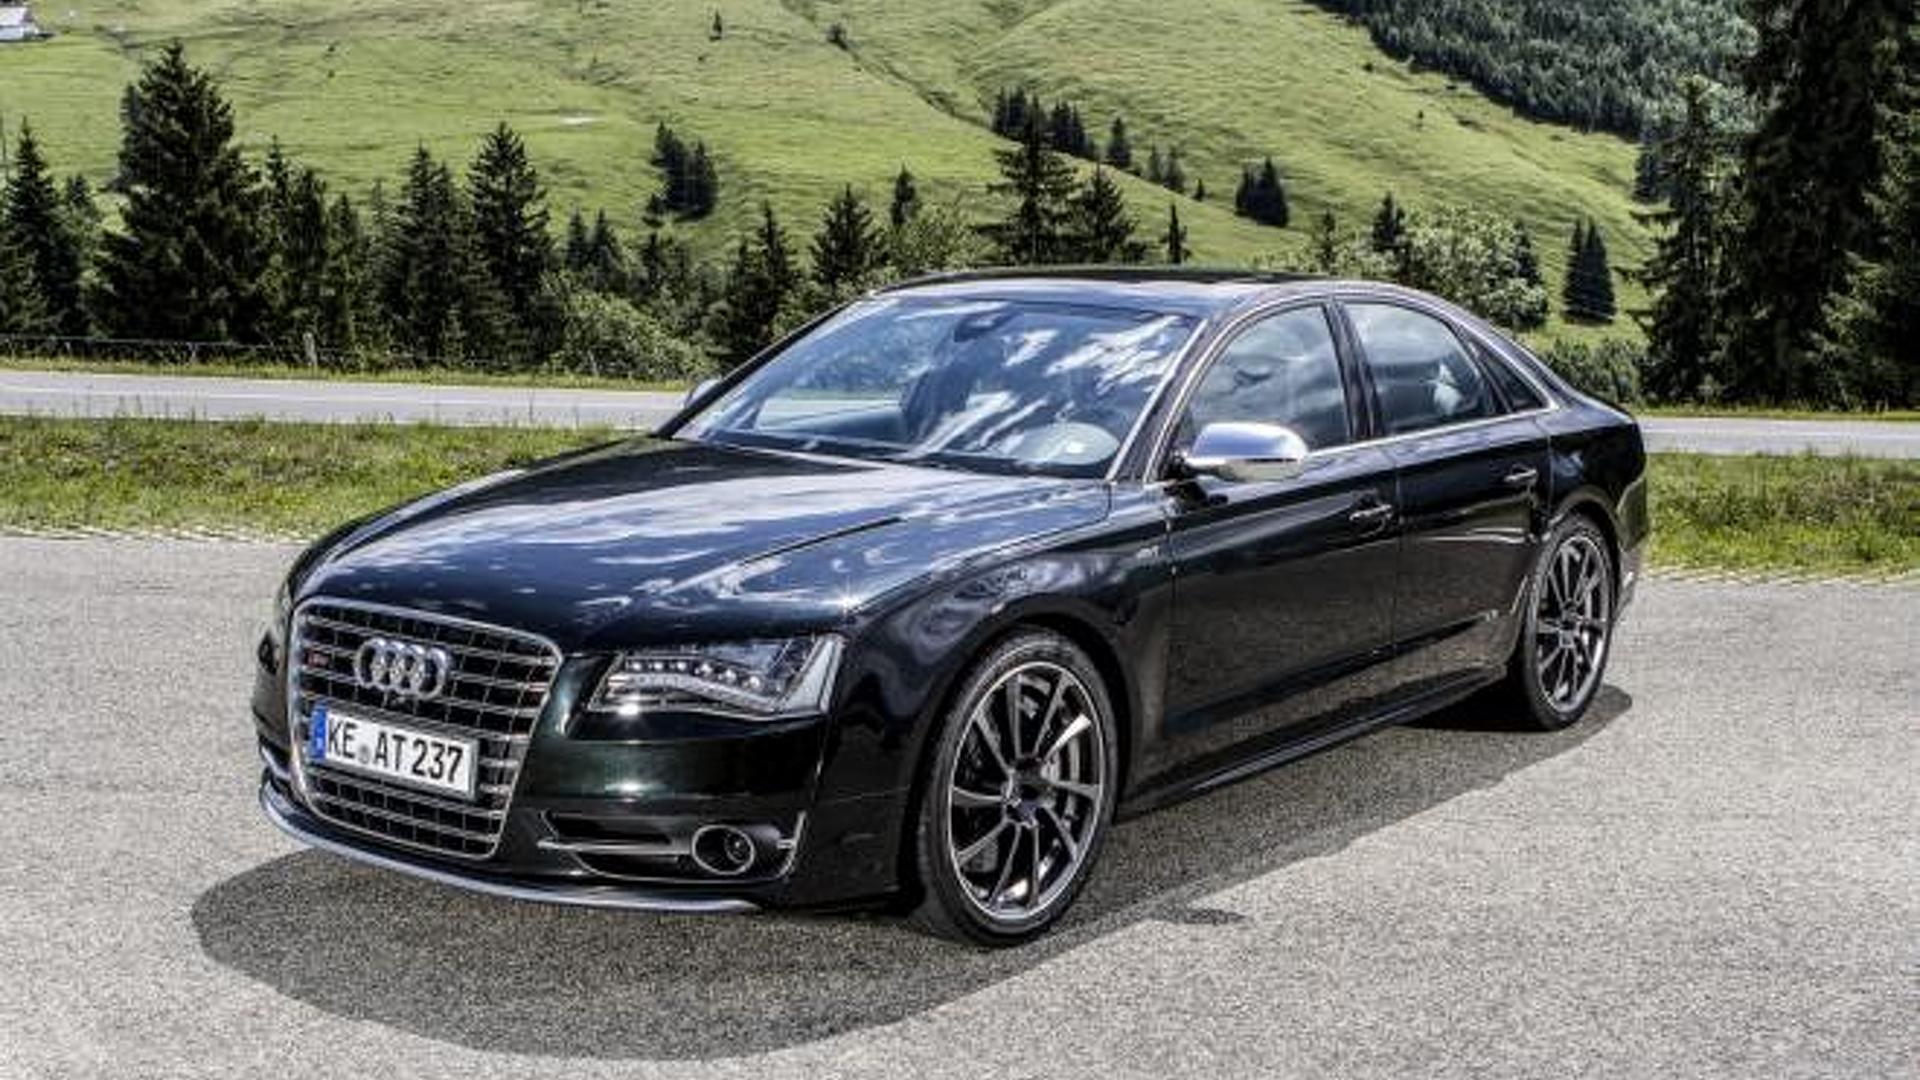 Kelebihan Kekurangan Audi S8 2013 Murah Berkualitas